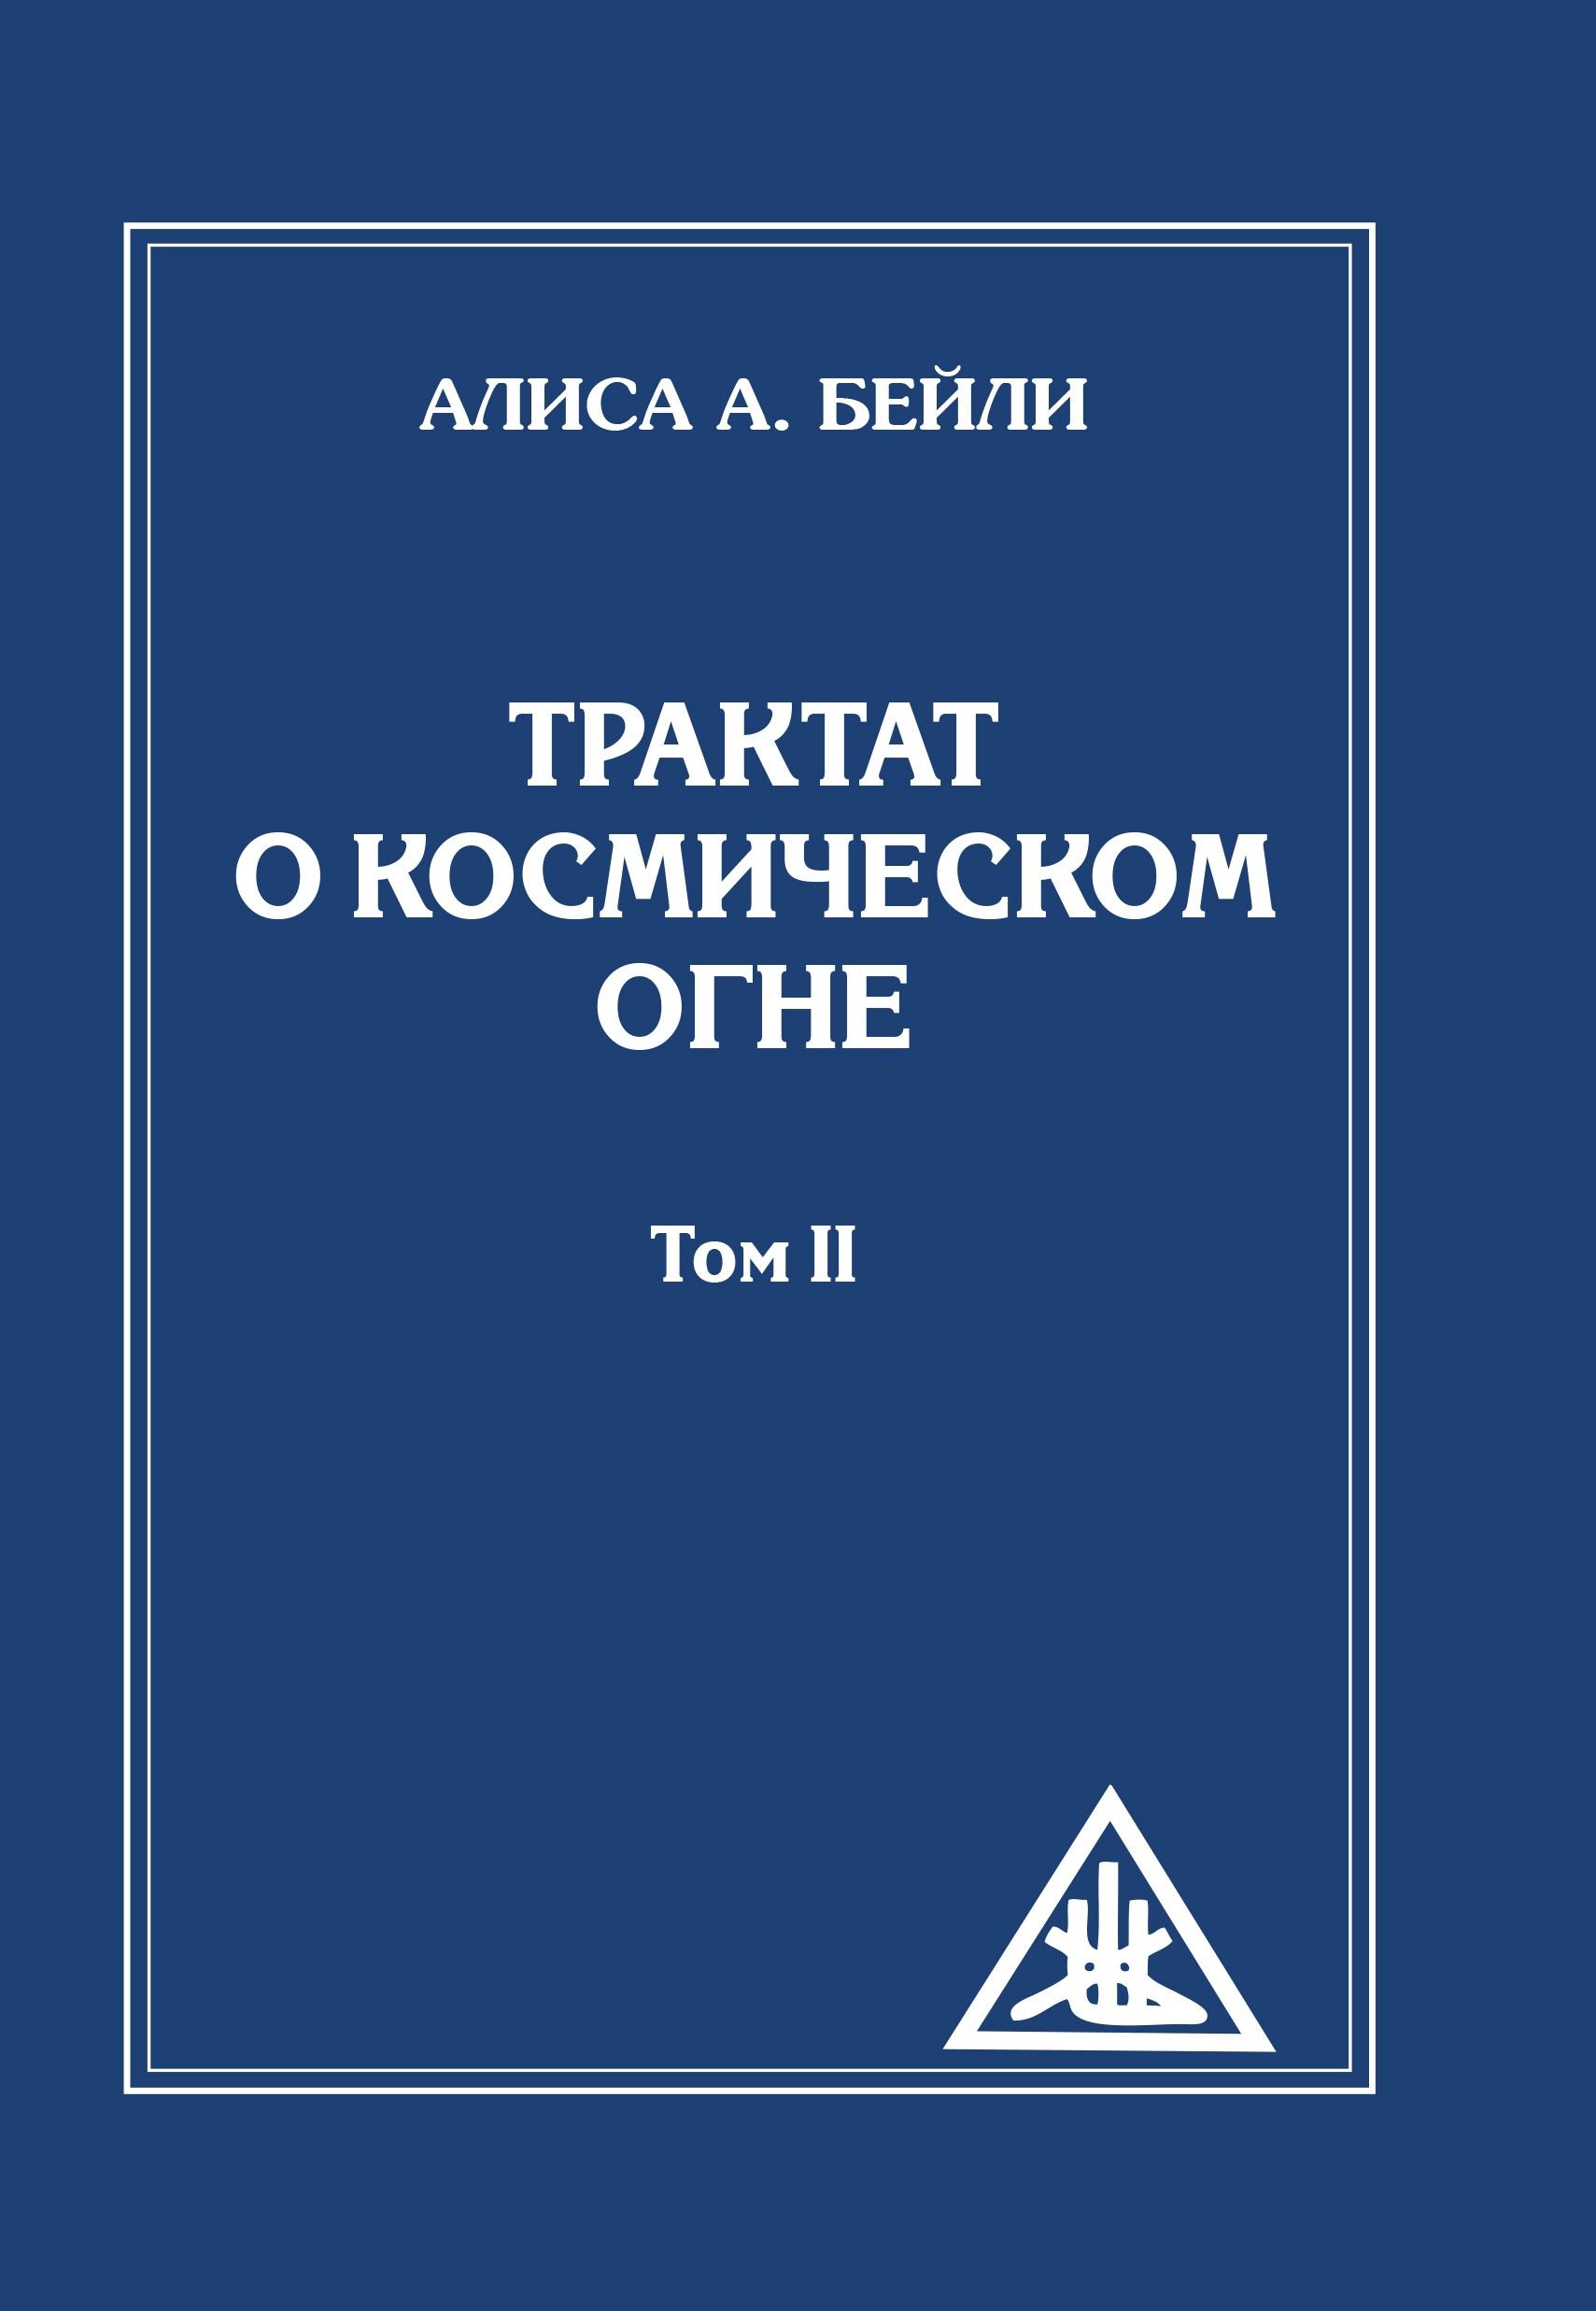 Трактат о Космическом Огне. Том 2. Алиса А. Бейли